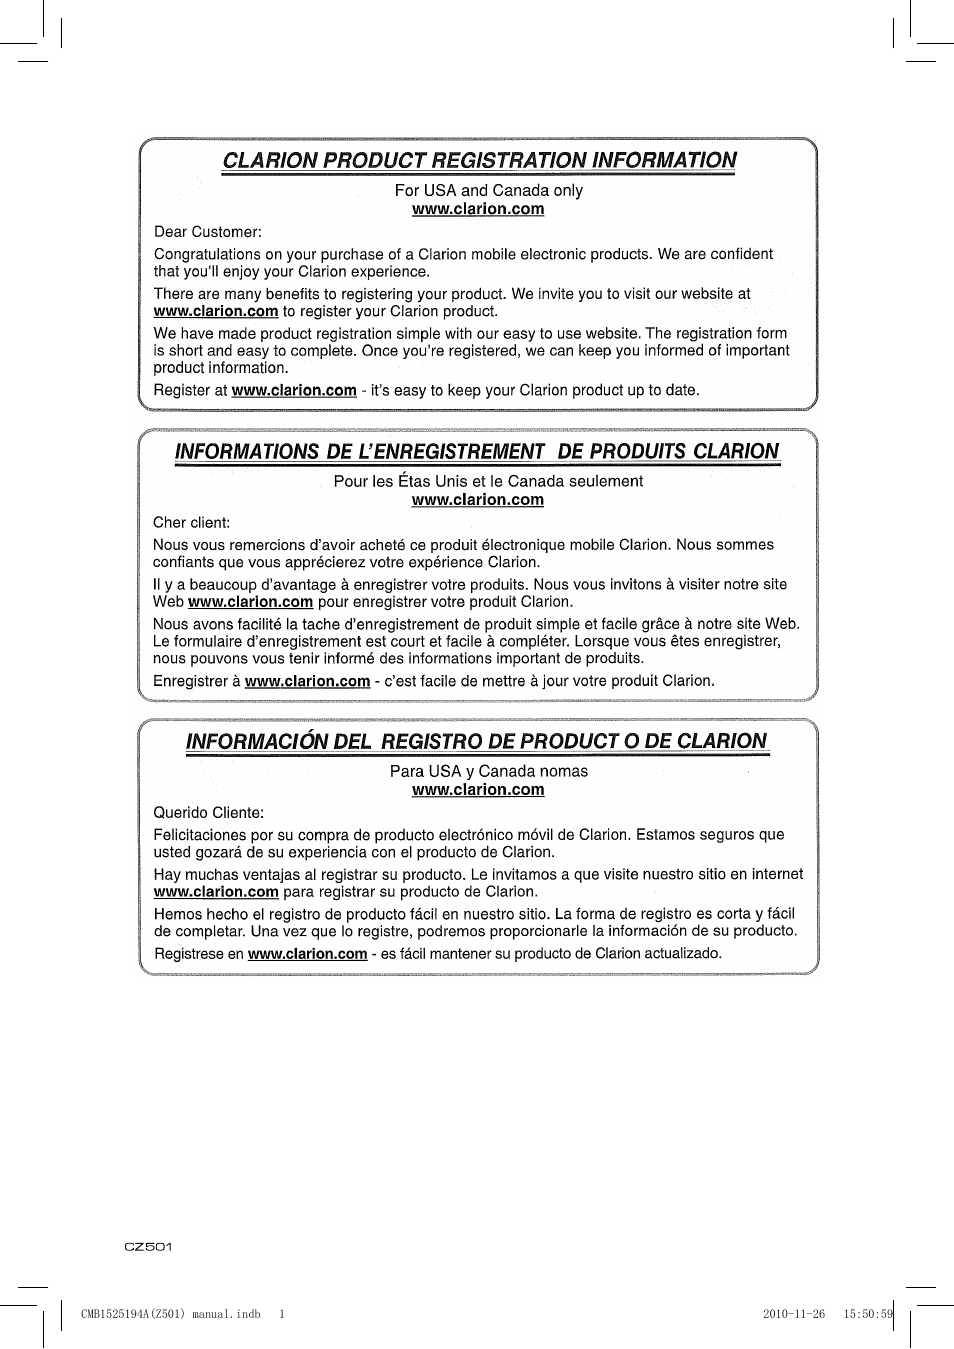 english clarion cz501 user manual page 2 34 rh manualsdir com Clarion CZ302 Clarion CZ302